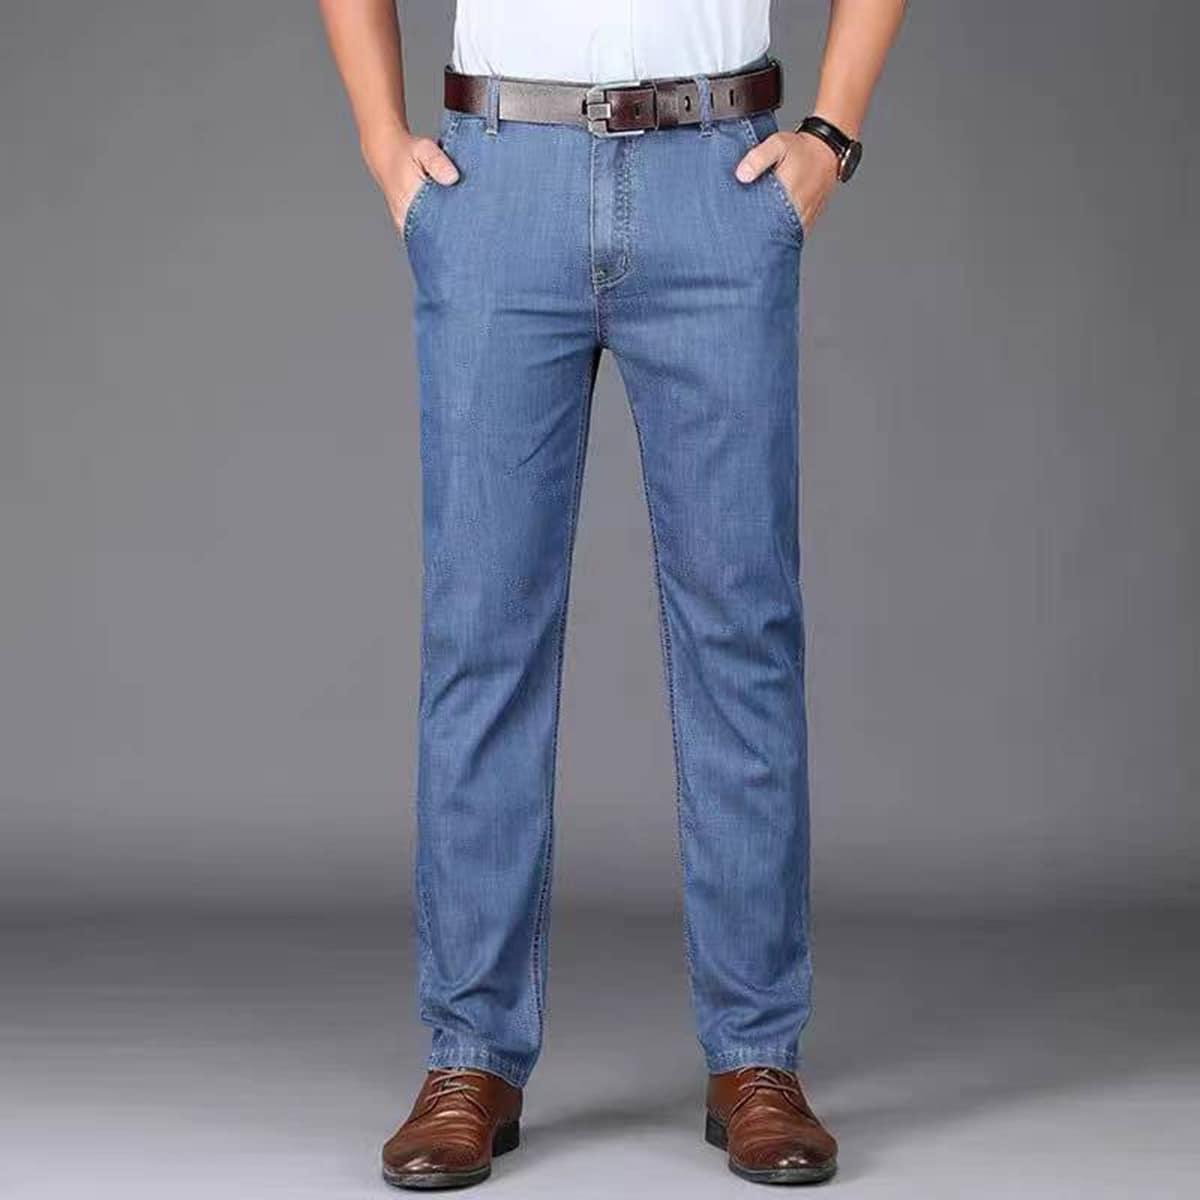 SHEIN Casual Vlak Jeans man Zak